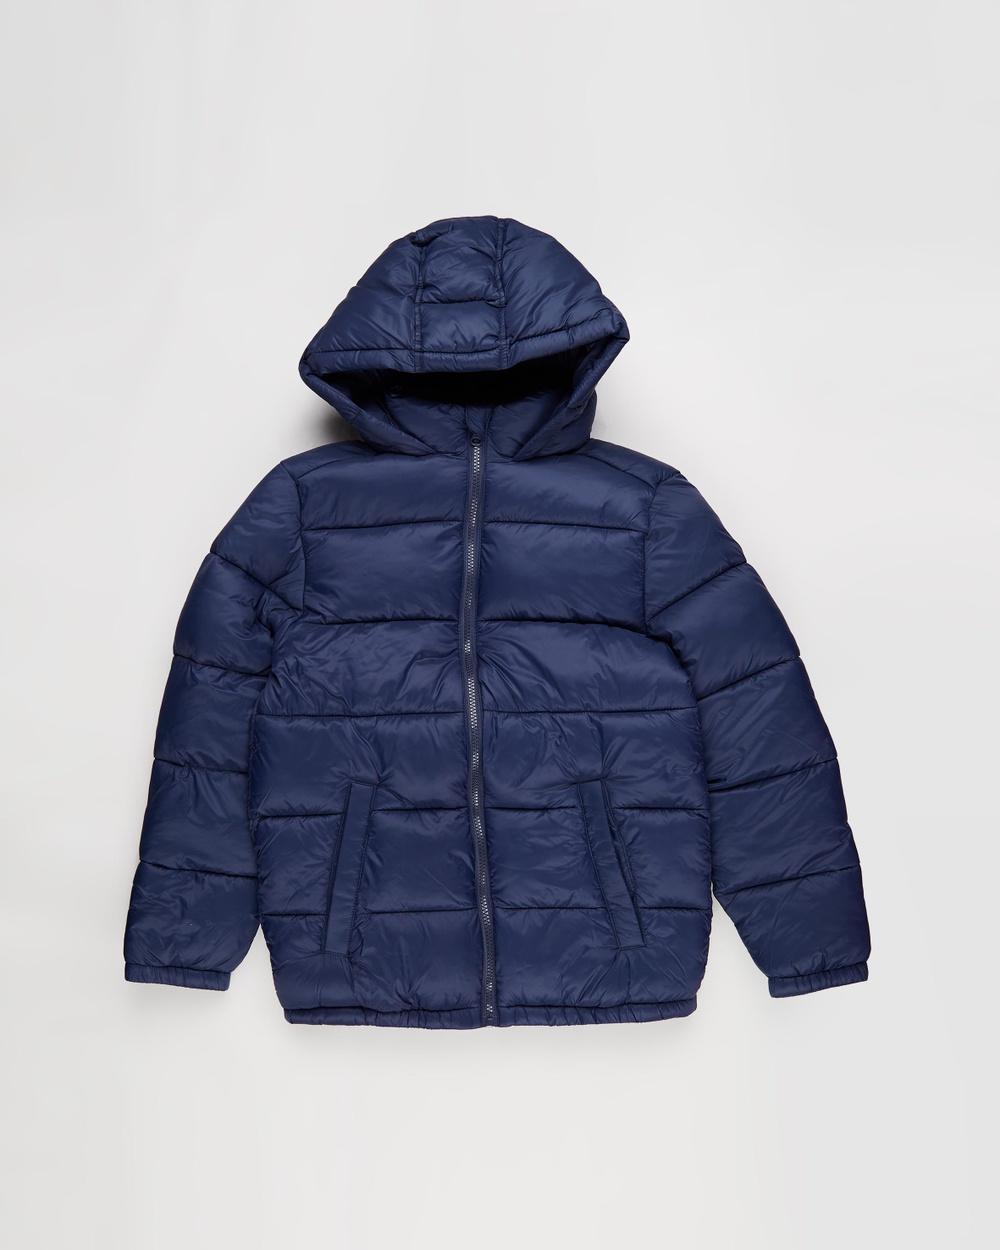 Free by Cotton On Charlie Puffer Jacket Teens Coats & Jackets Indigo Australia